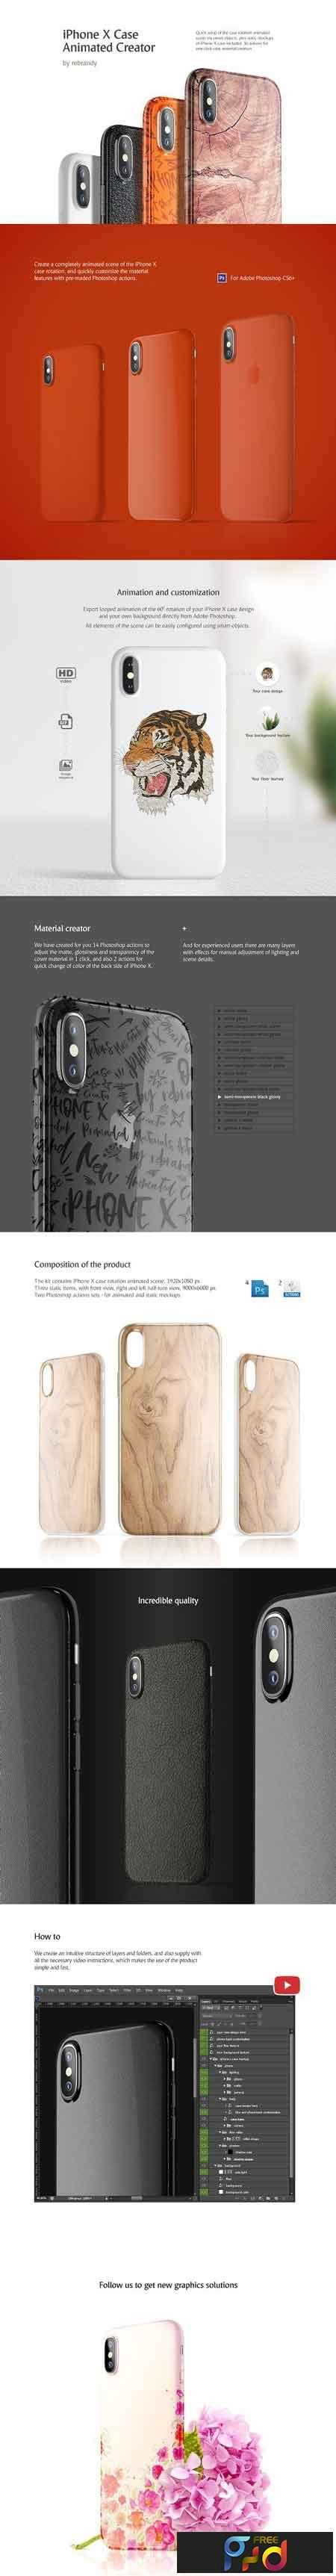 1808068 IPhone X Case Animated Creator 2573428 1